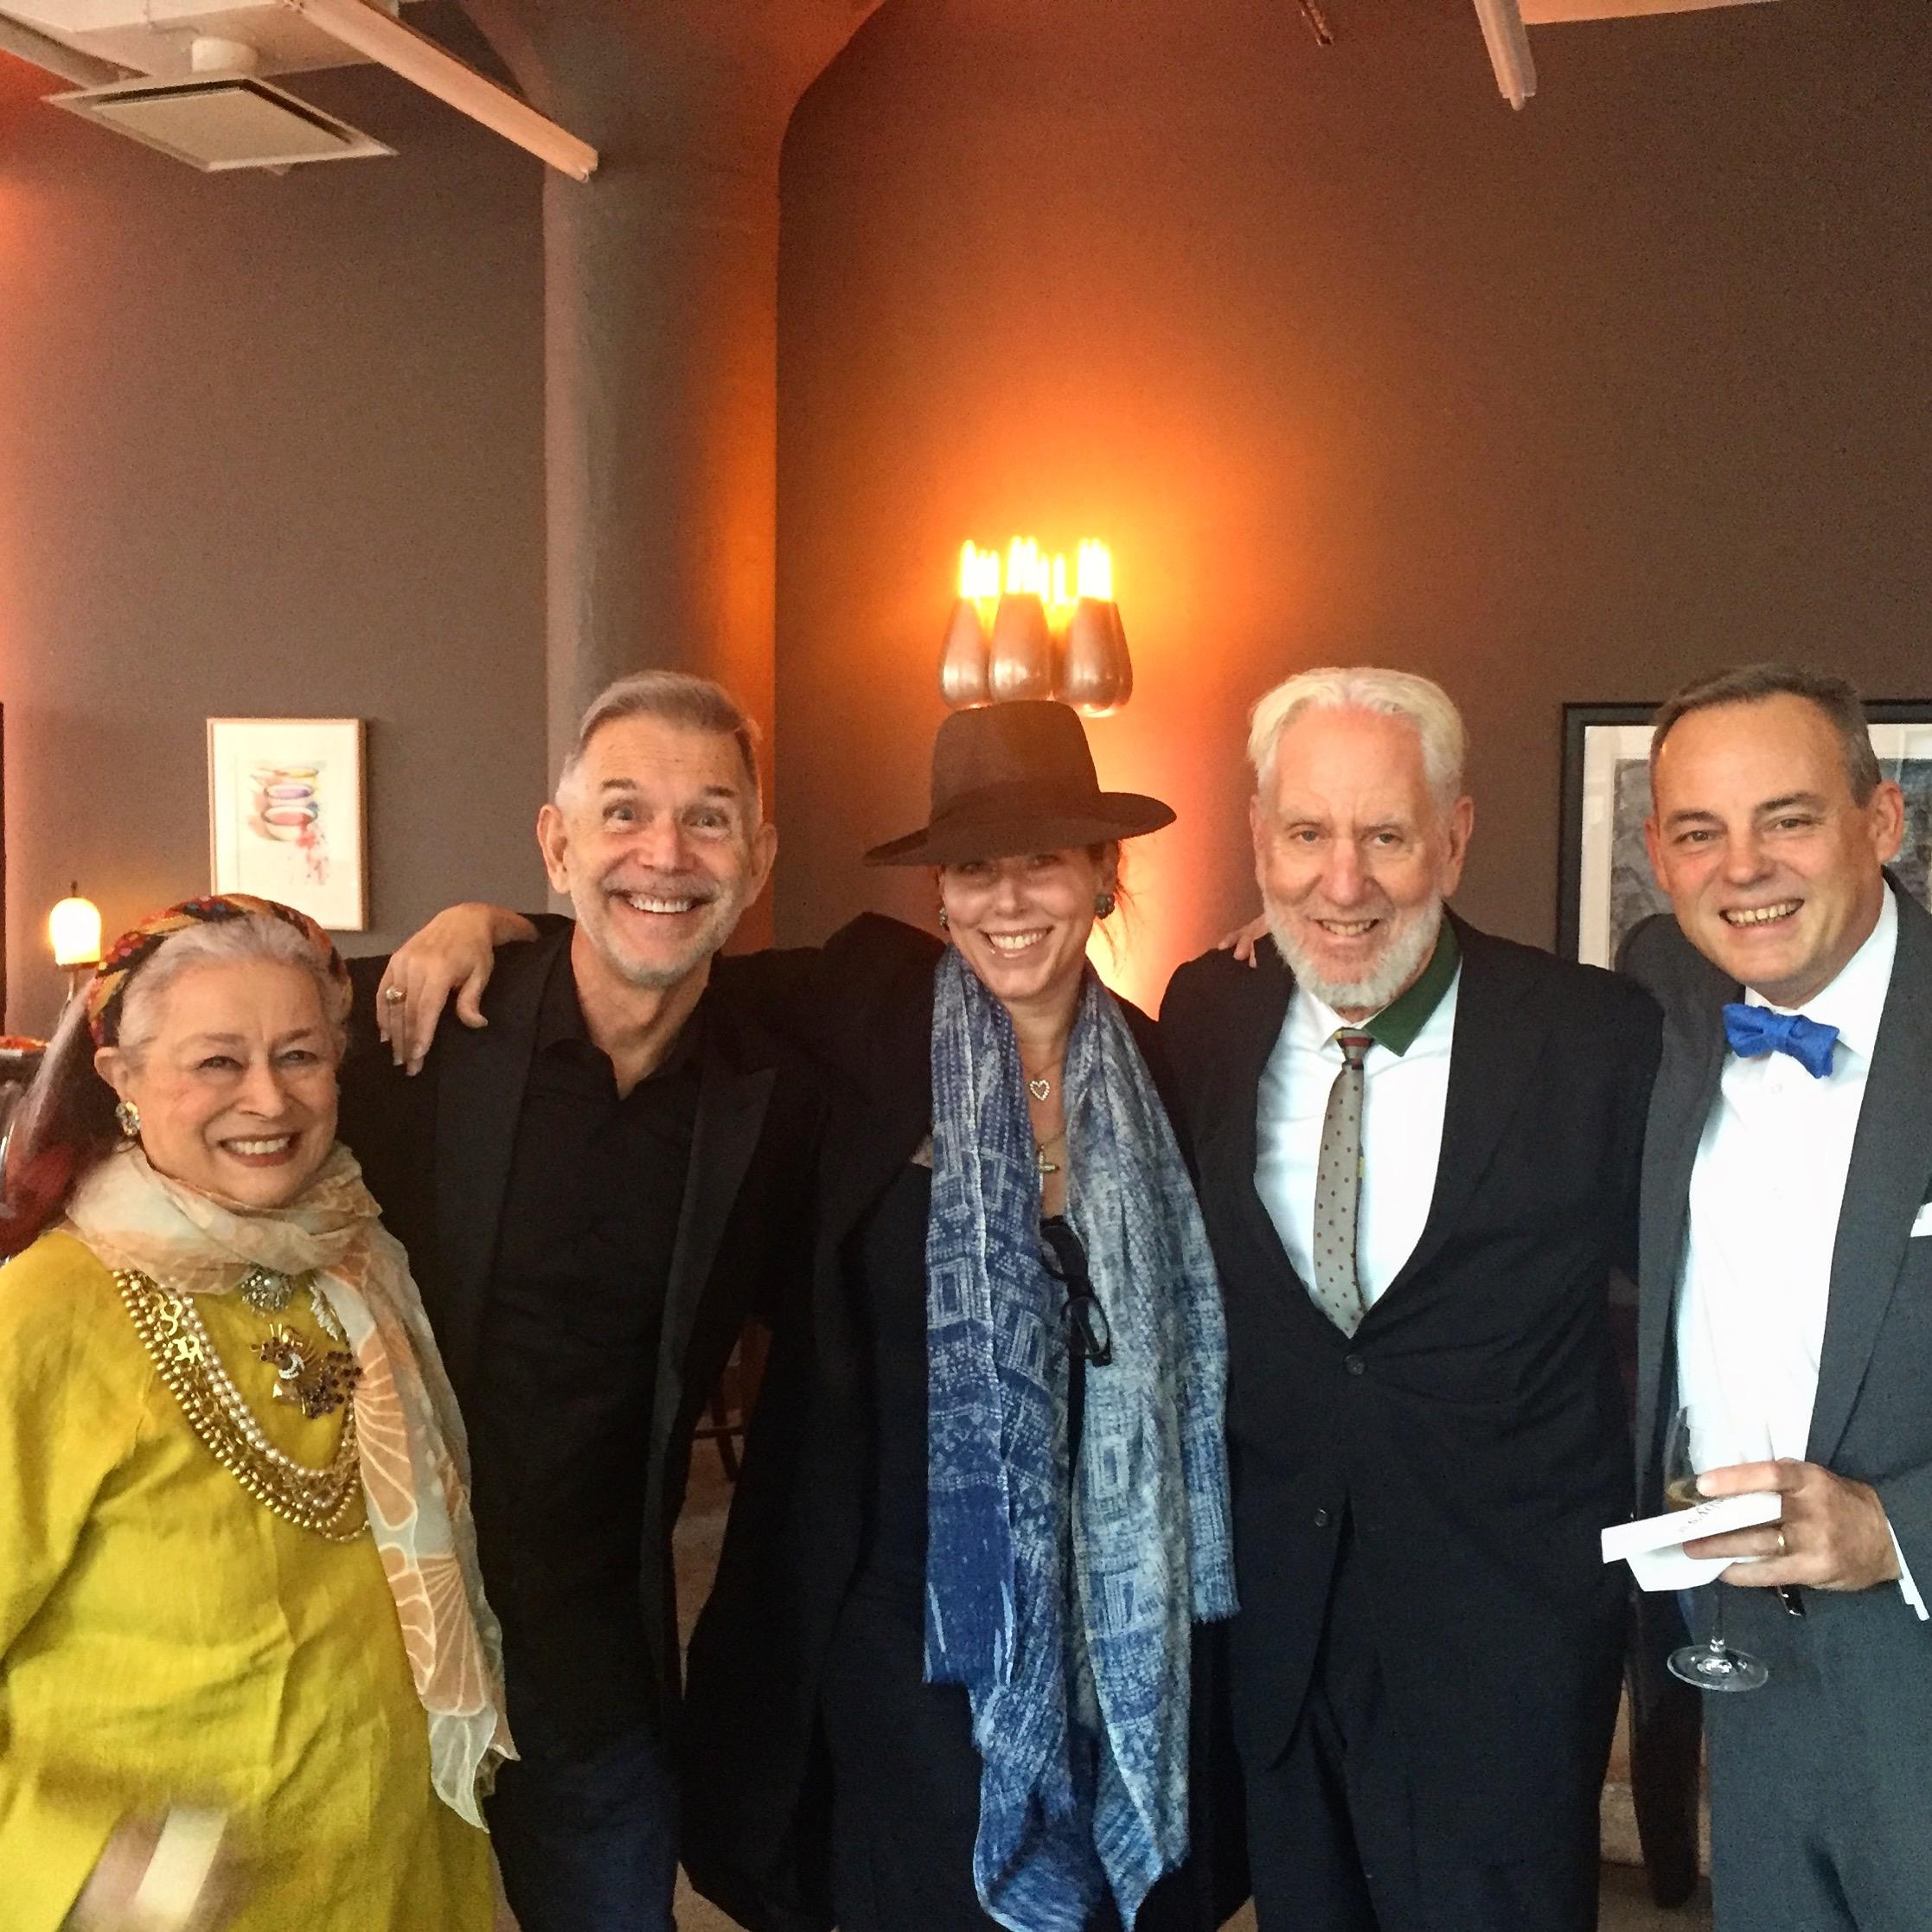 West Coast Editor, Amanda Quinn Olivar (with Joan Agajanian Quinn, Mike Chearney, Lloyd Ziff, and Charlie Schepps, Sotheby's NYC)